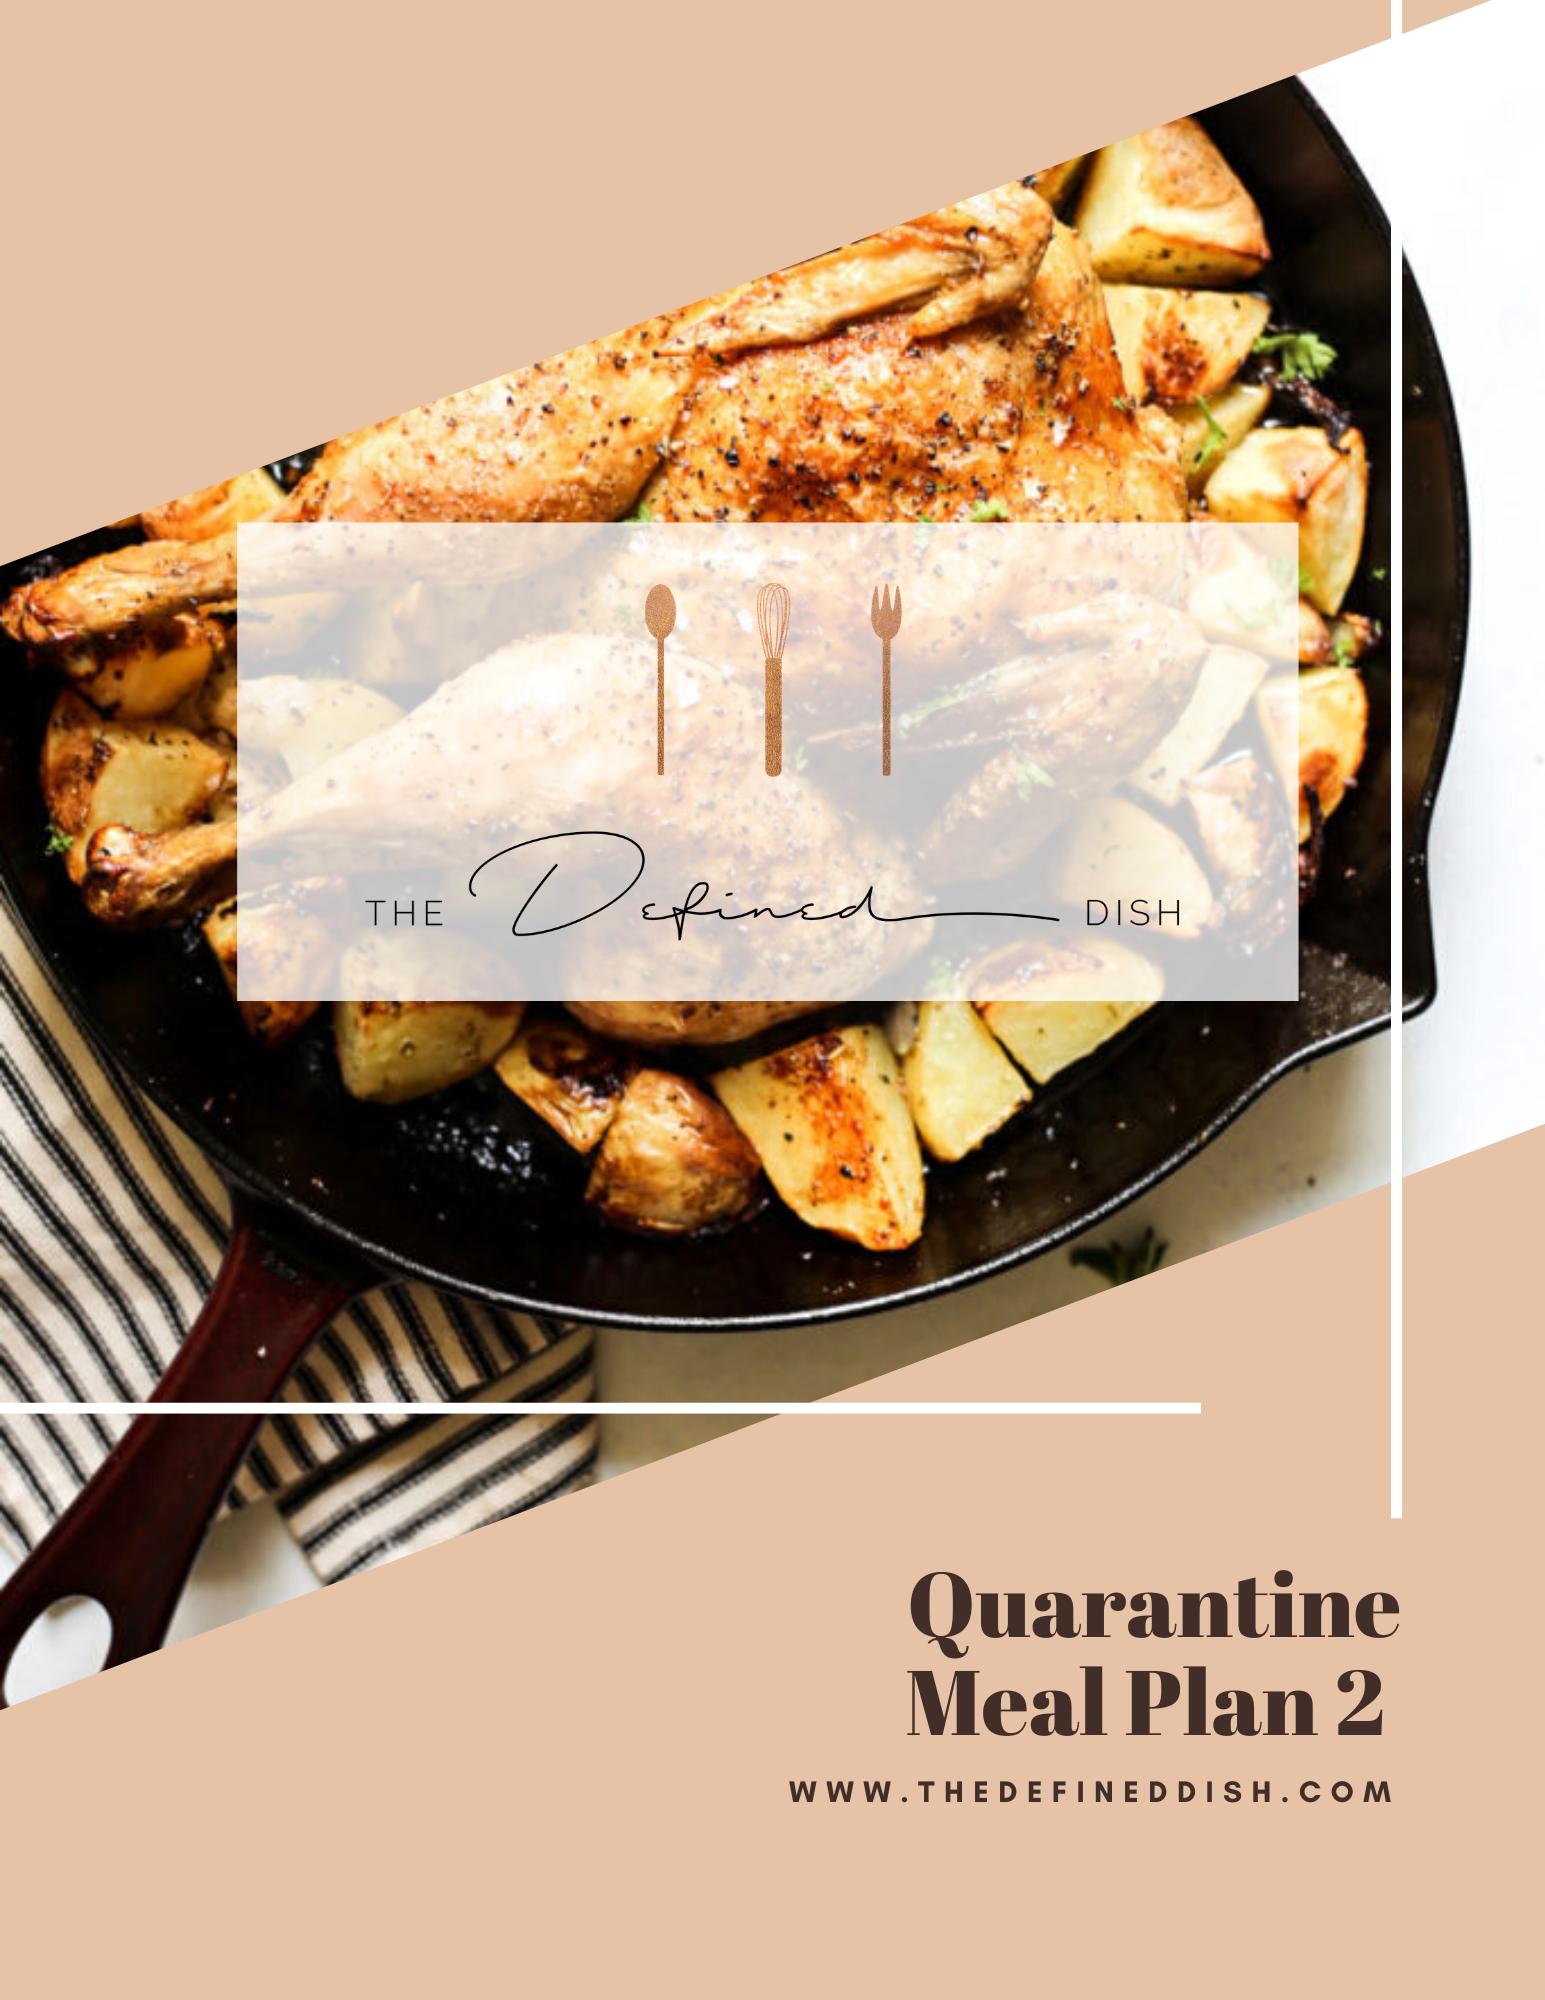 Quarantine Meal Plan 2